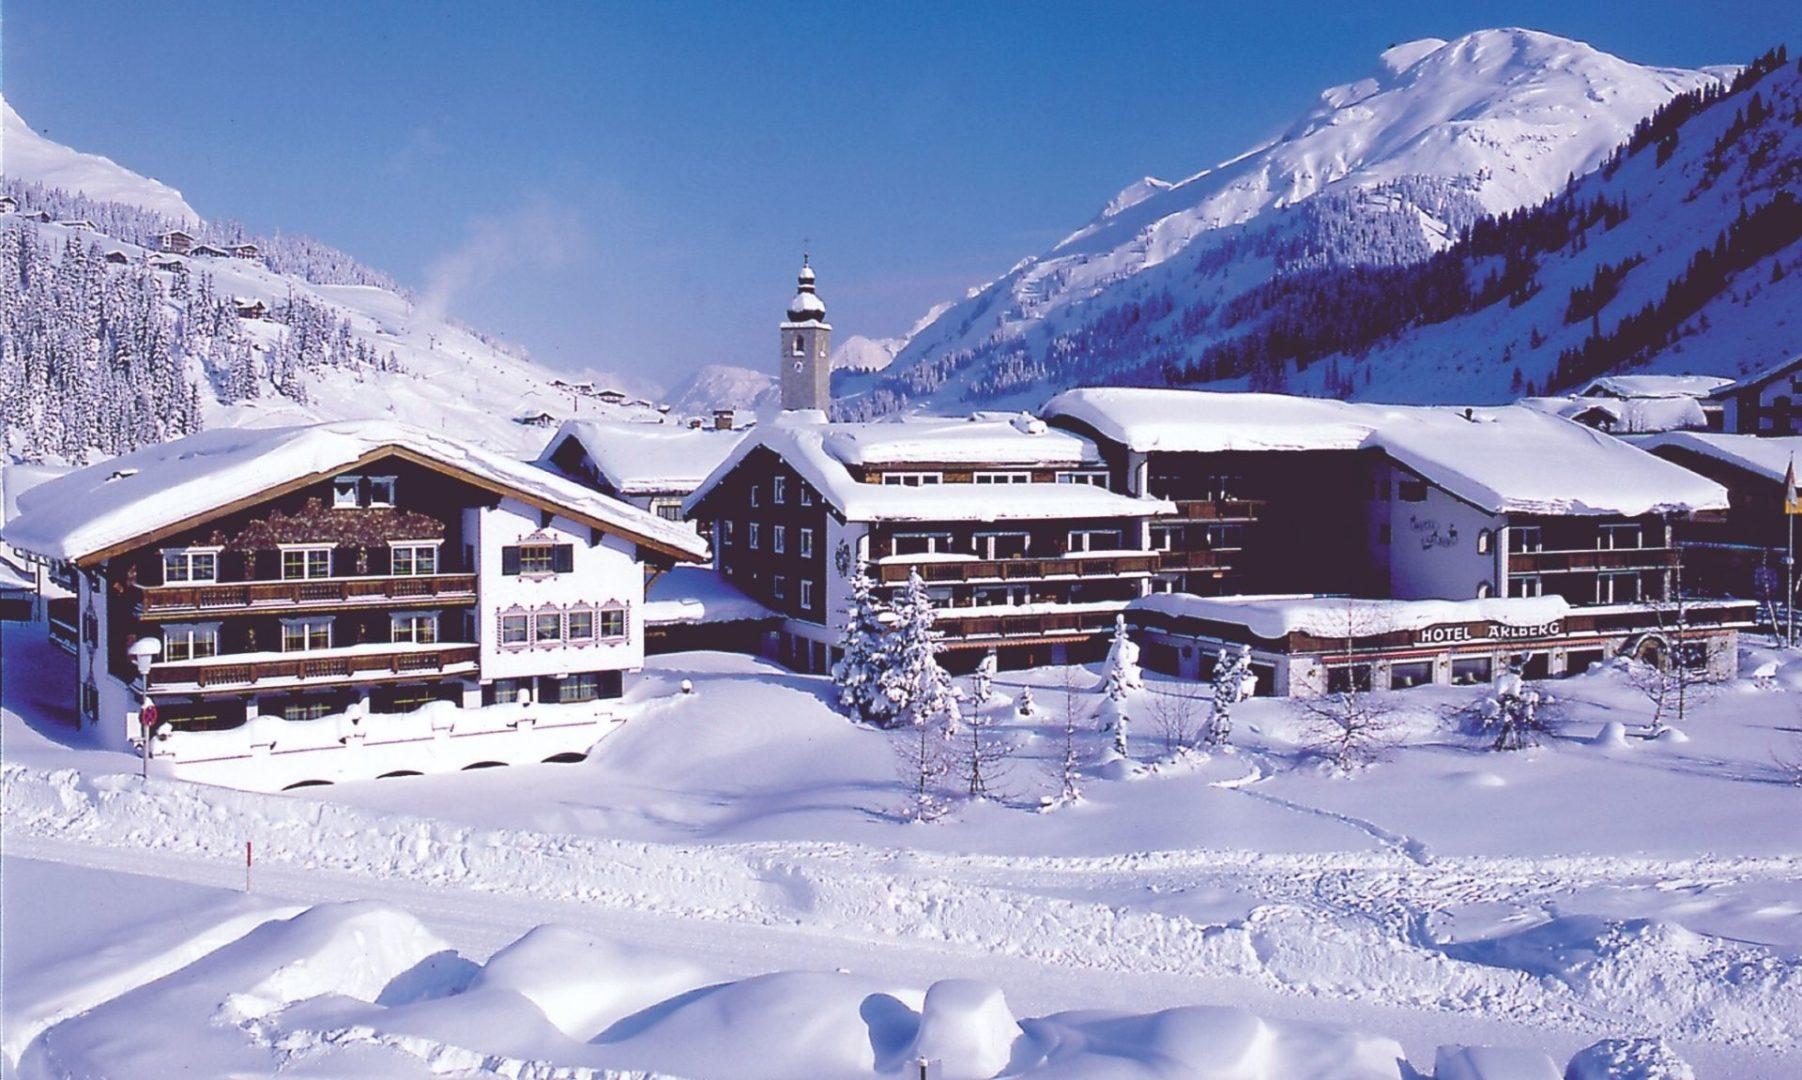 The Hotel Arlberg